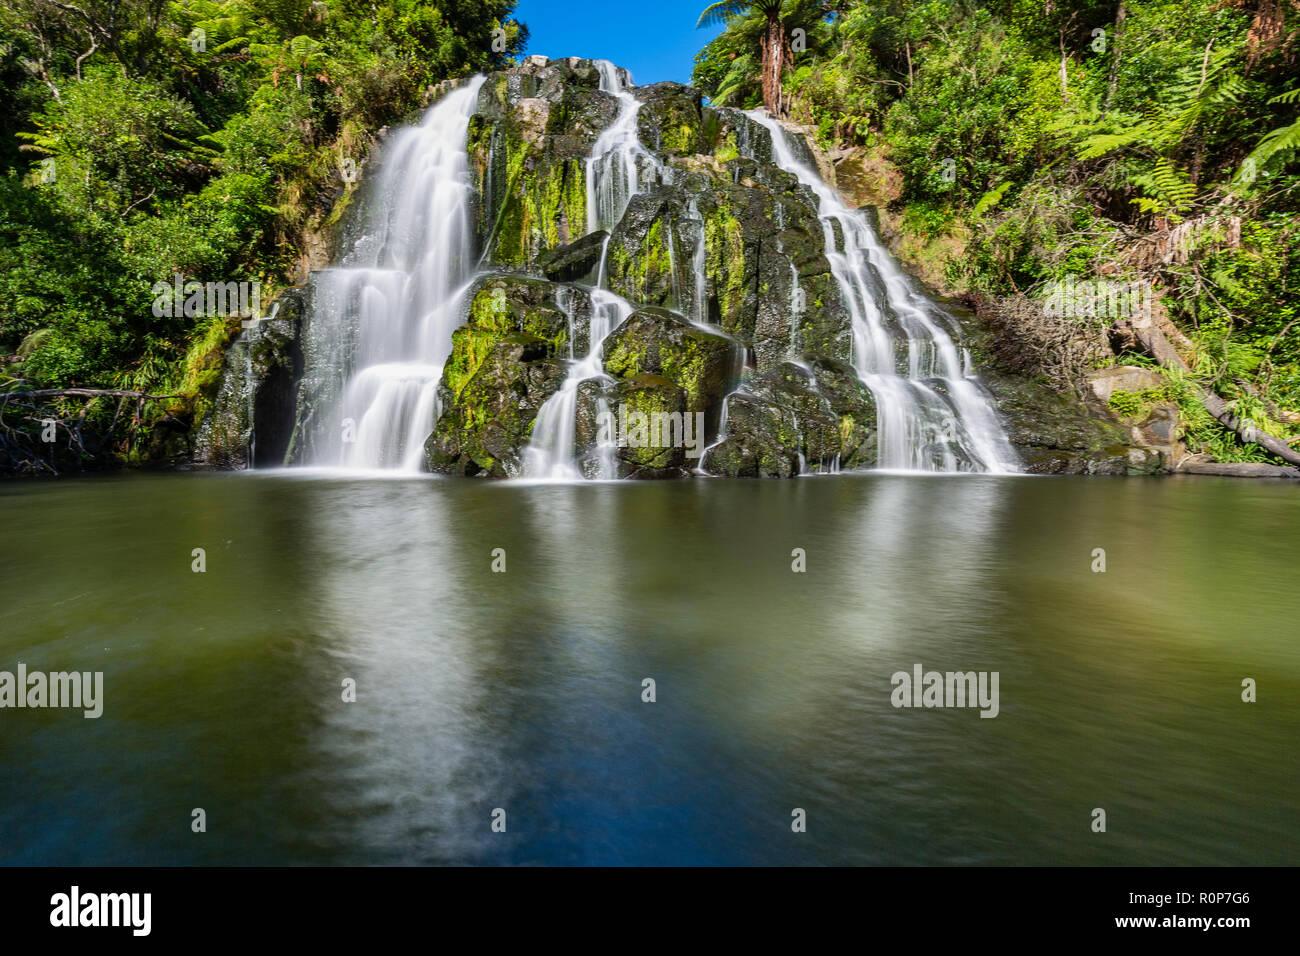 Owharoa magique Falls, péninsule de Coromandel, Nouvelle-Zélande Photo Stock